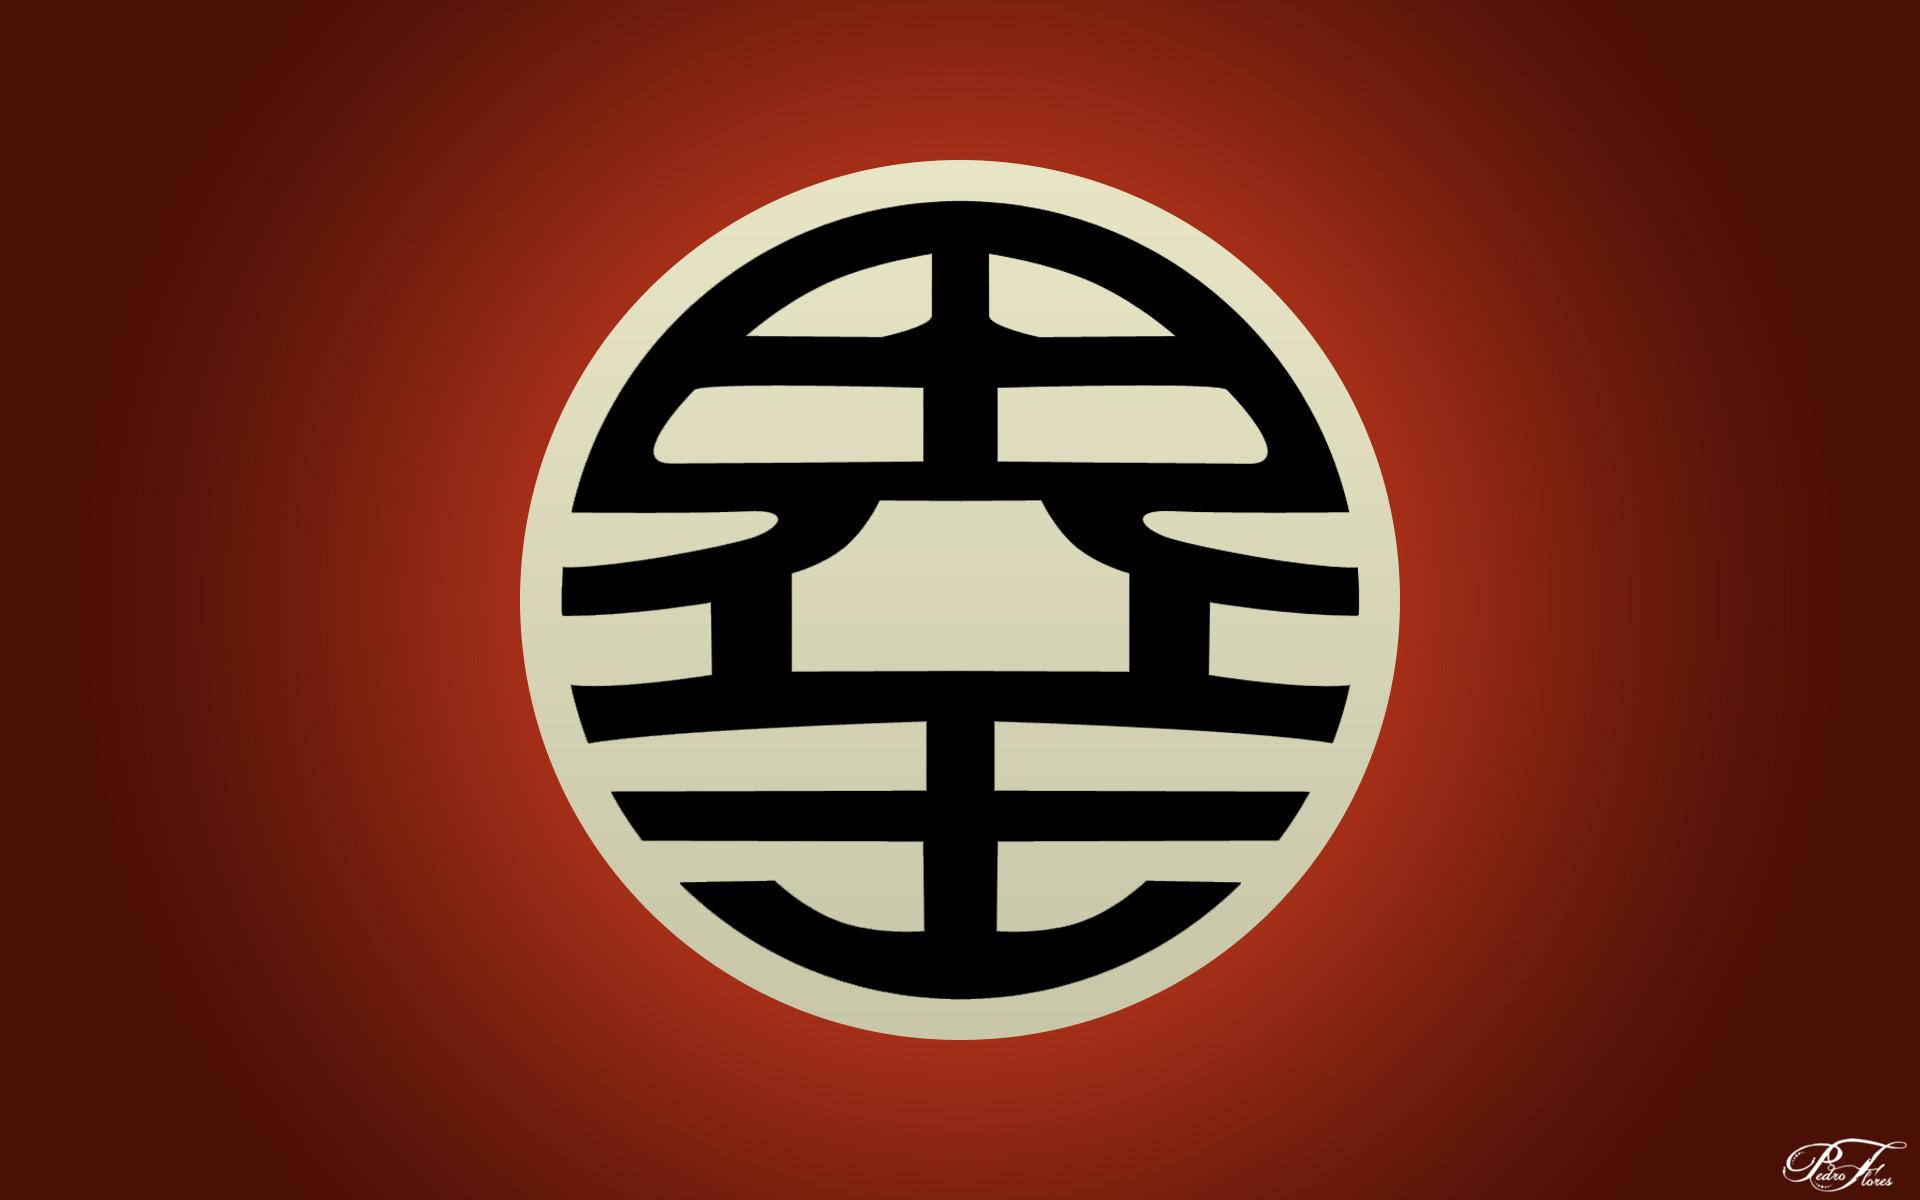 dragon ball z wallpapers symbol